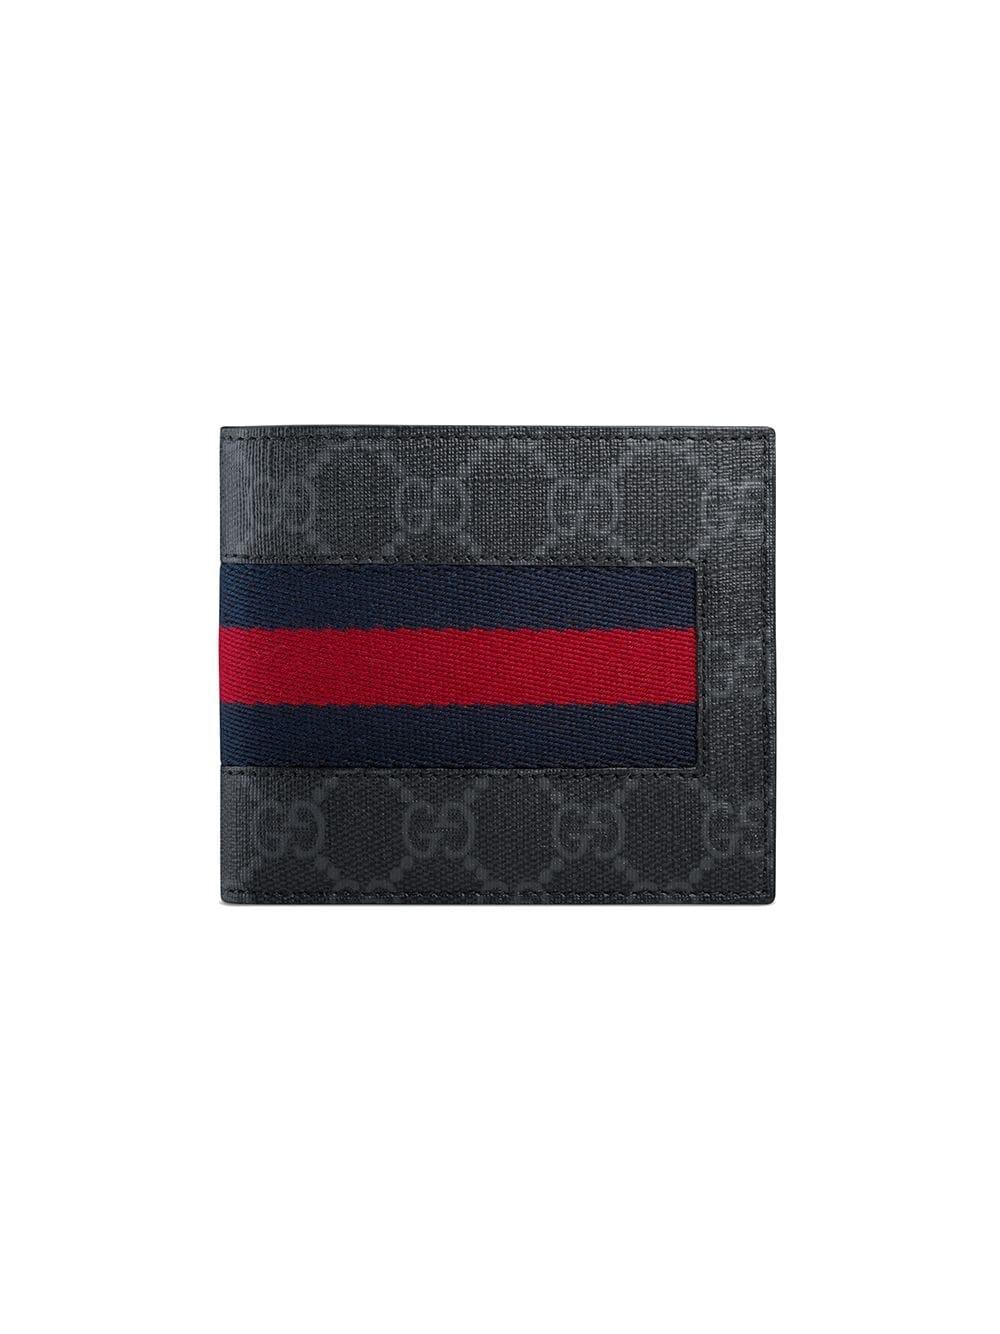 Gucci Bifold Coin Wallet GG Supreme Web Black